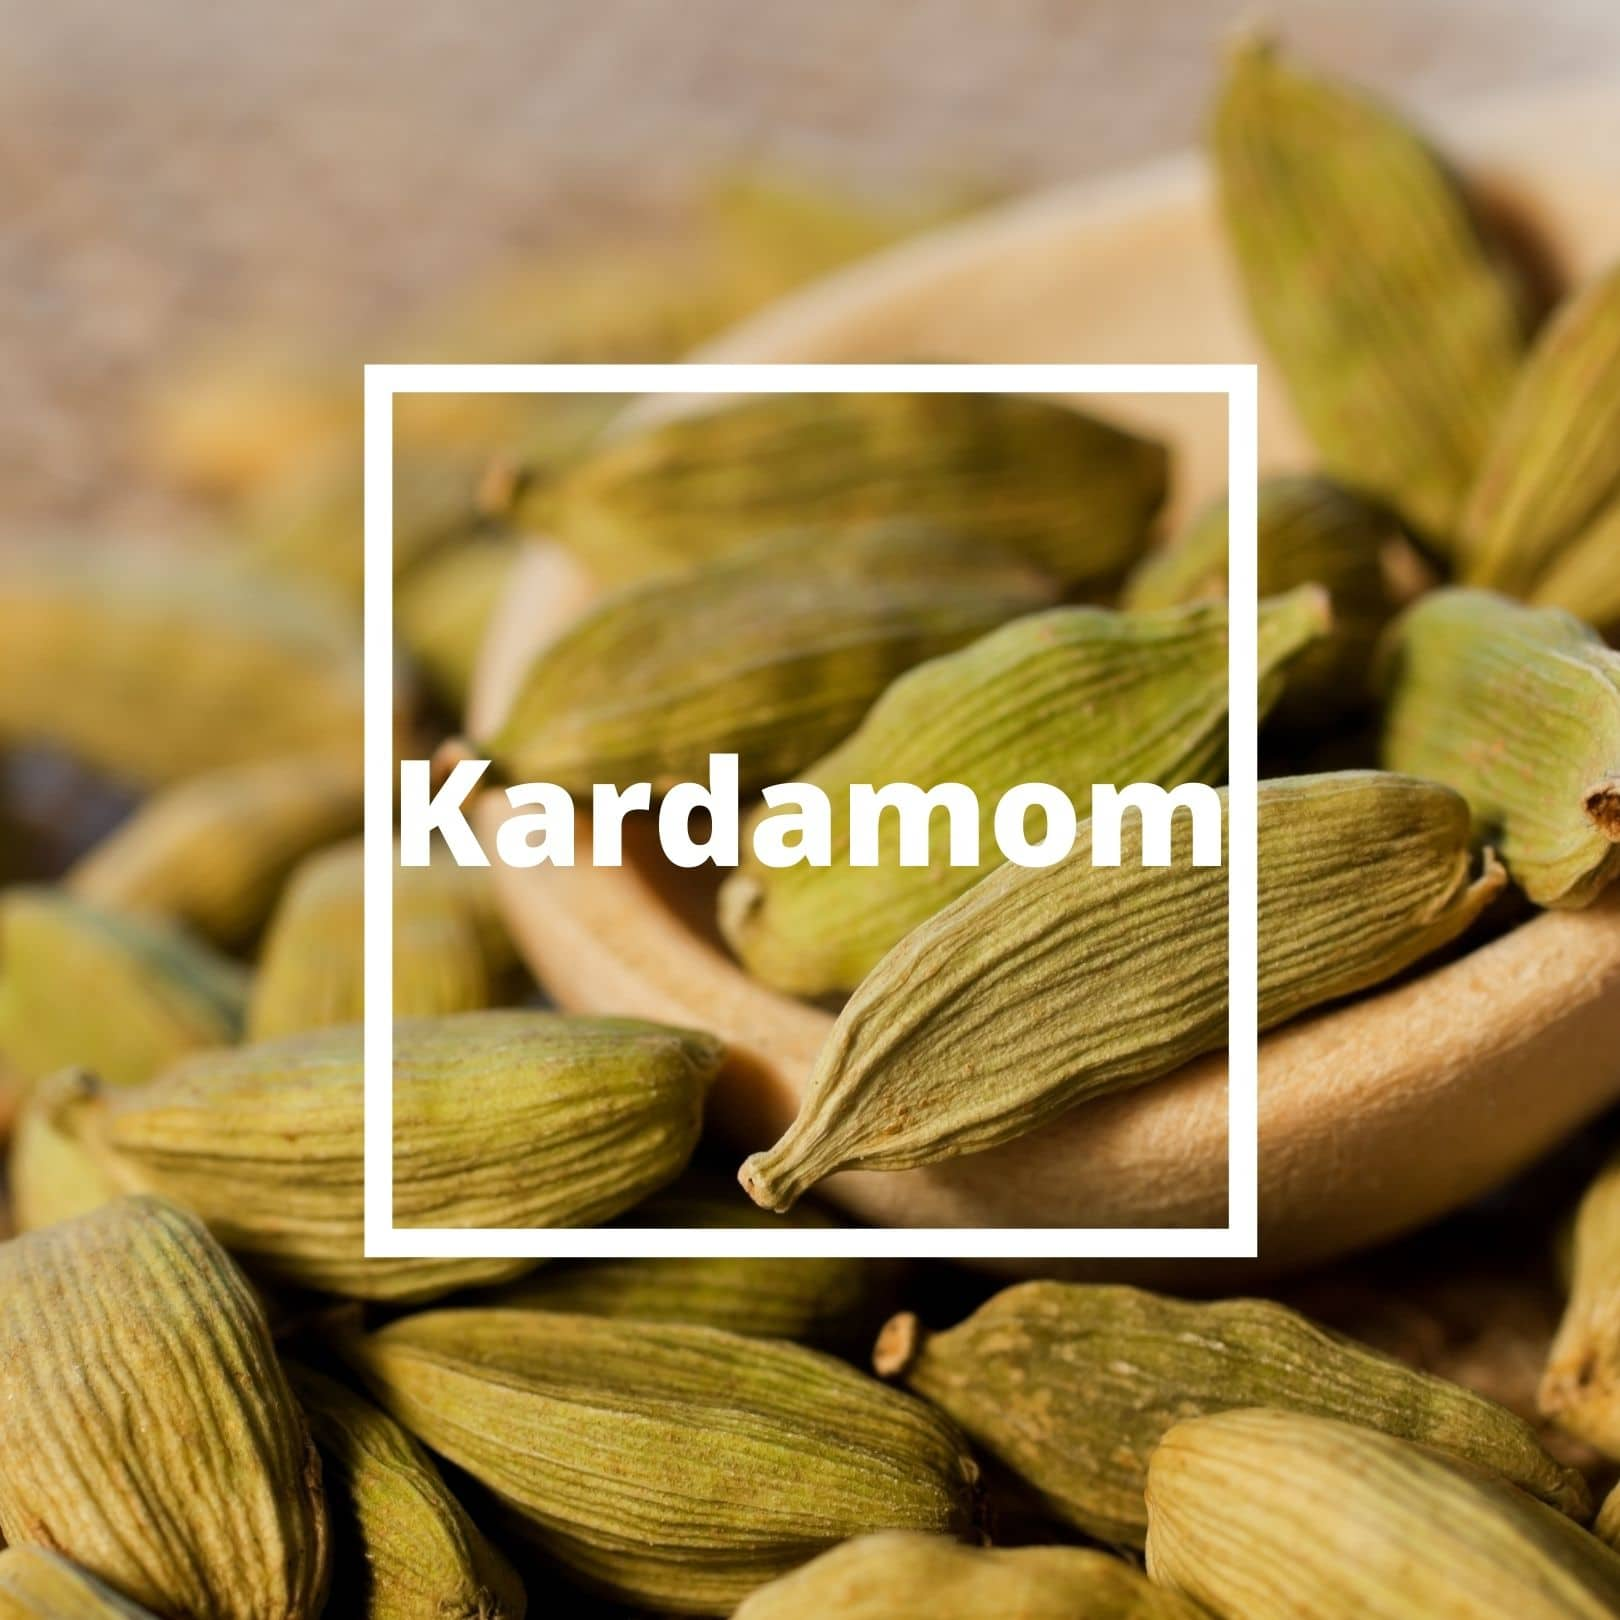 L'ATELIERO - Kardamom - Irresistible Man